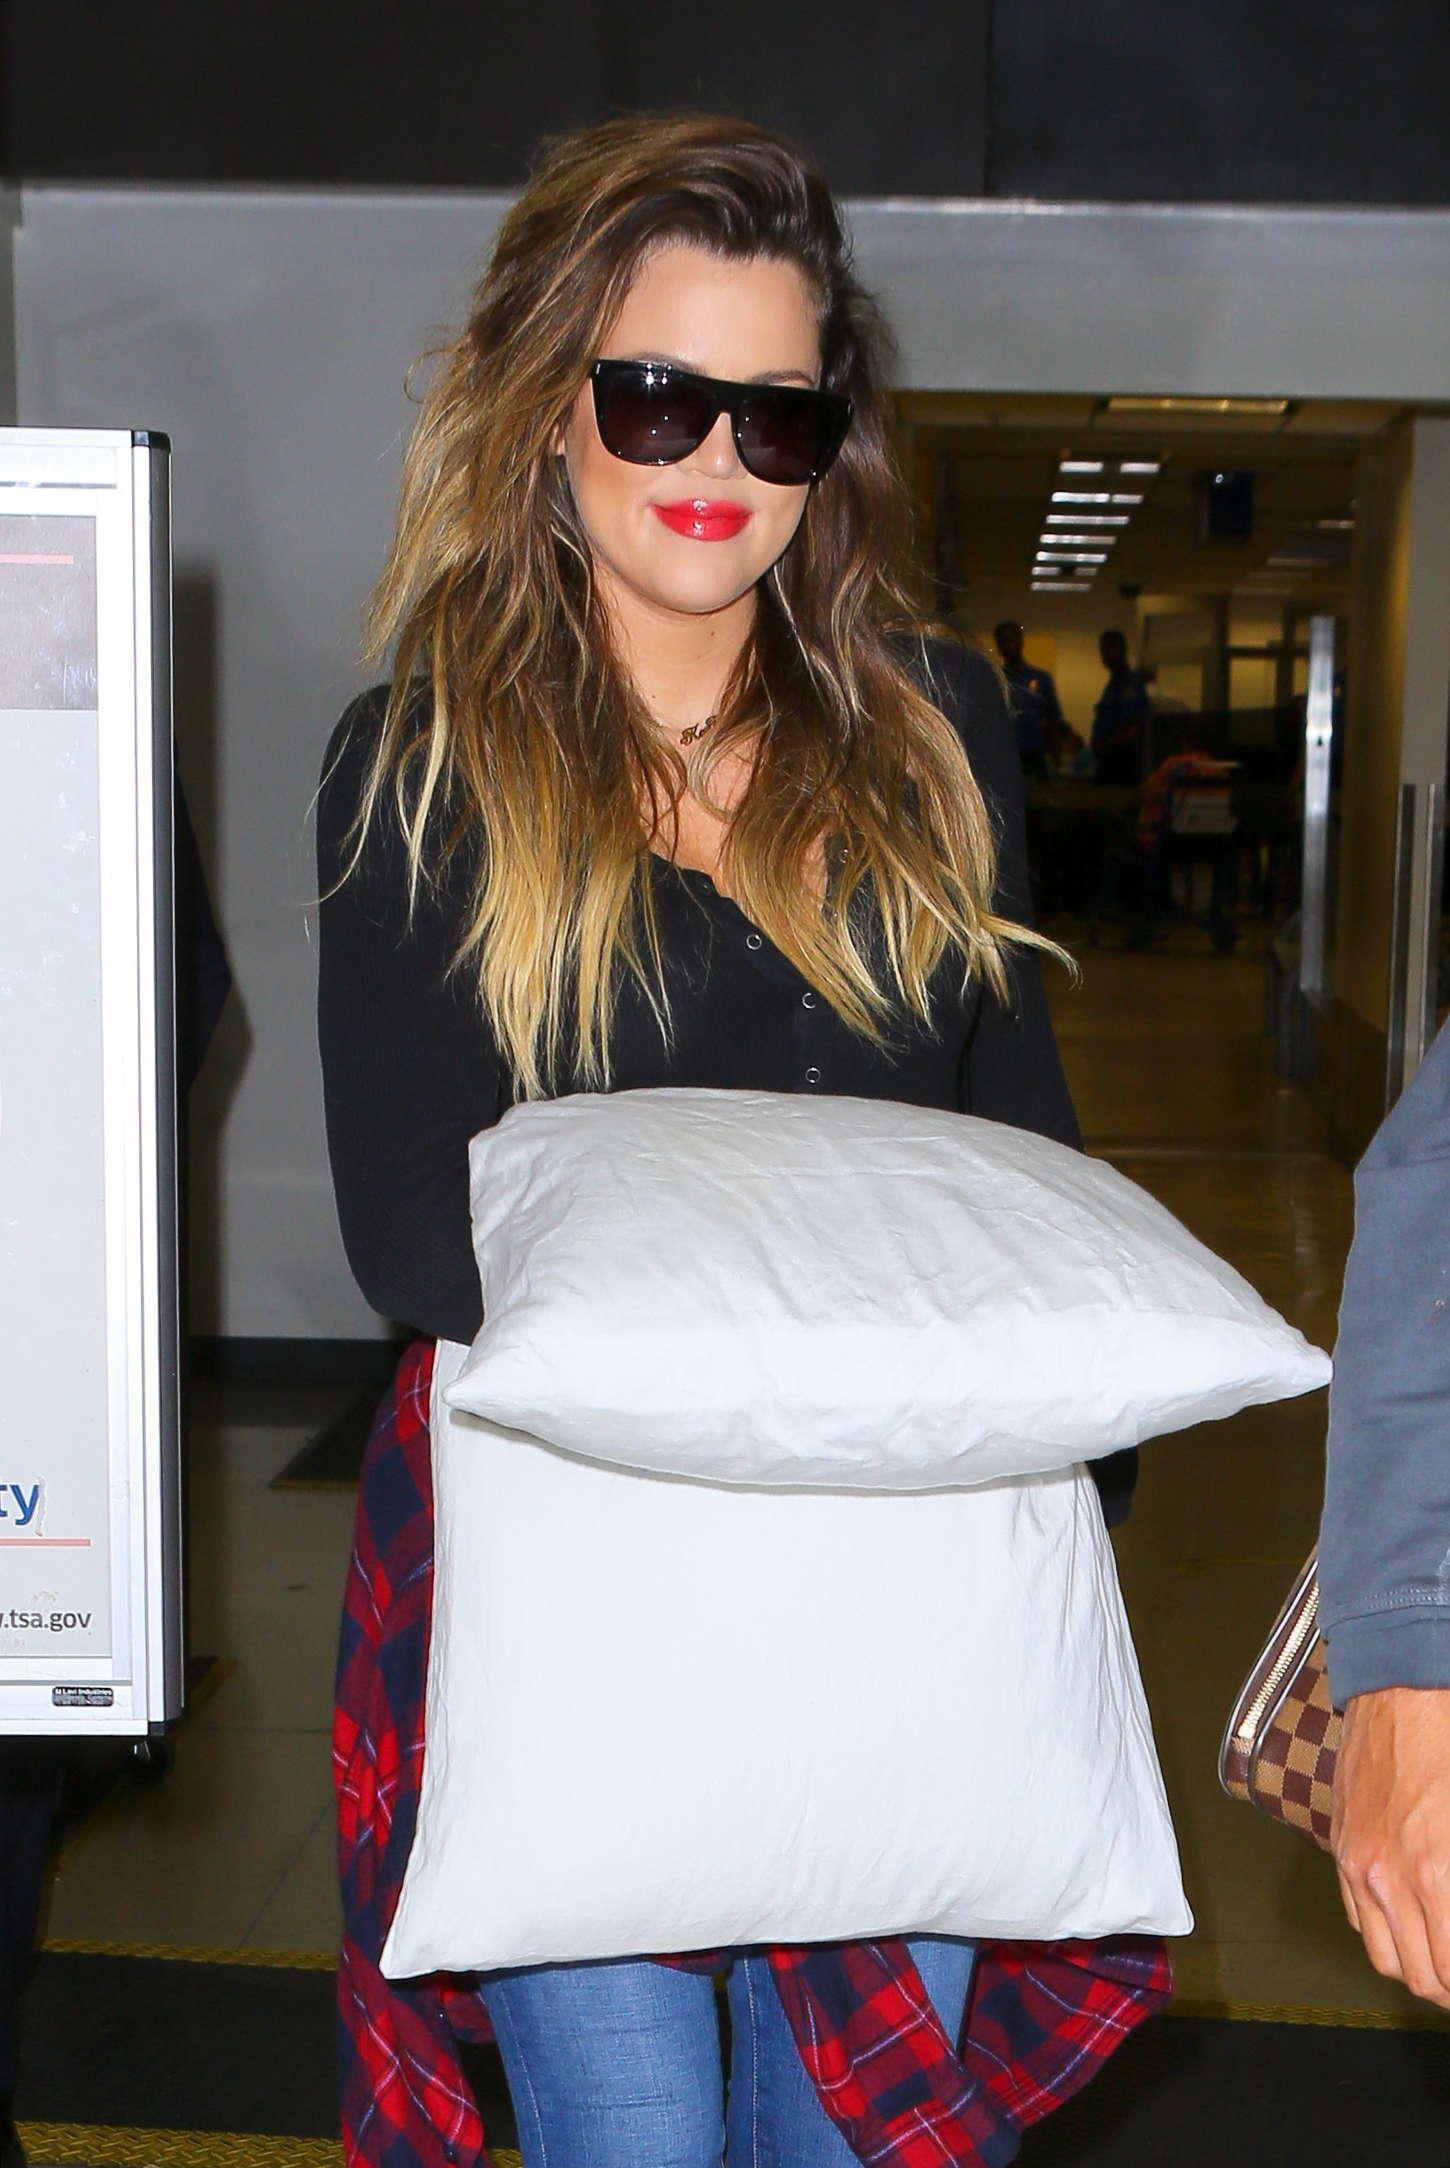 Khloe Kardashian 2014 : Khloe Kardashian with Scott Disick at LAX airport -14